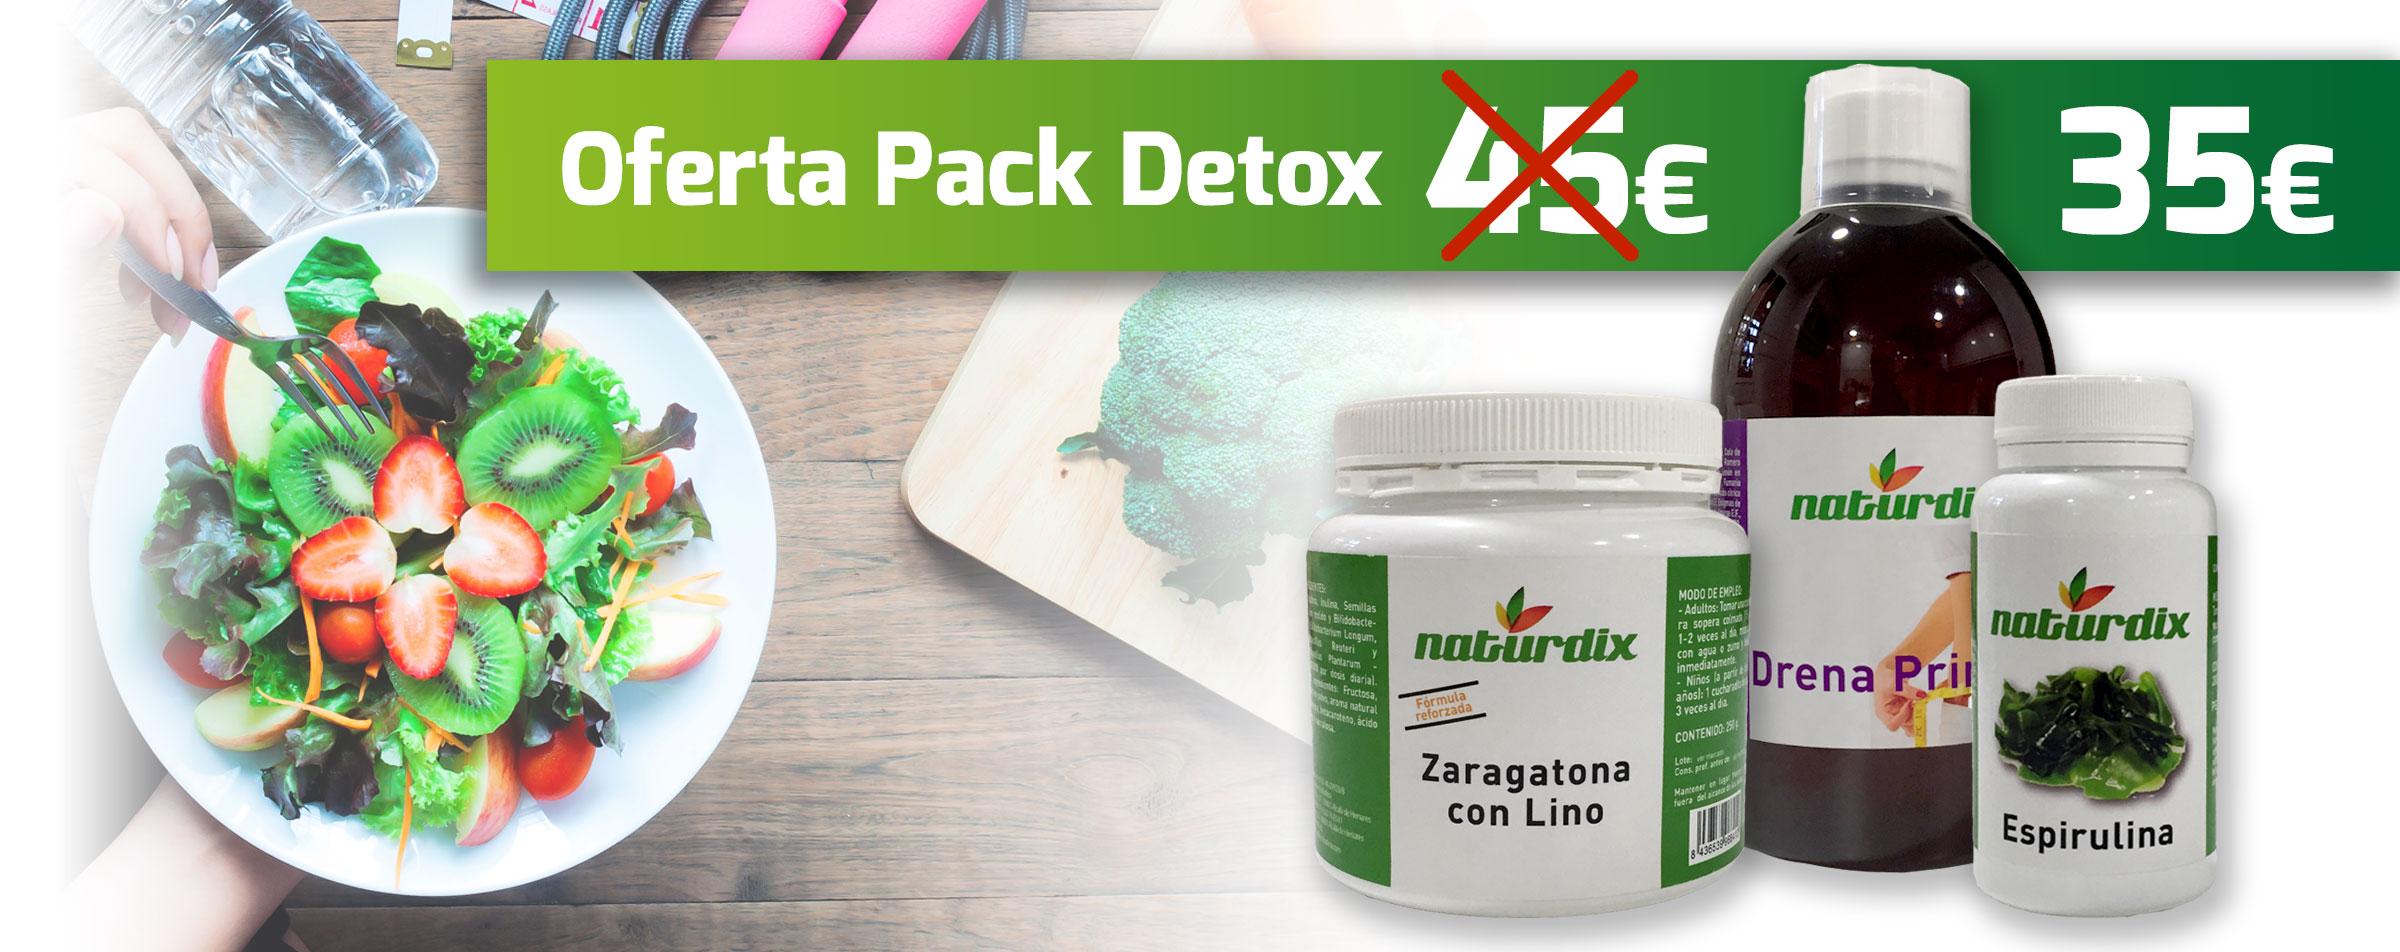 oferta pack detox